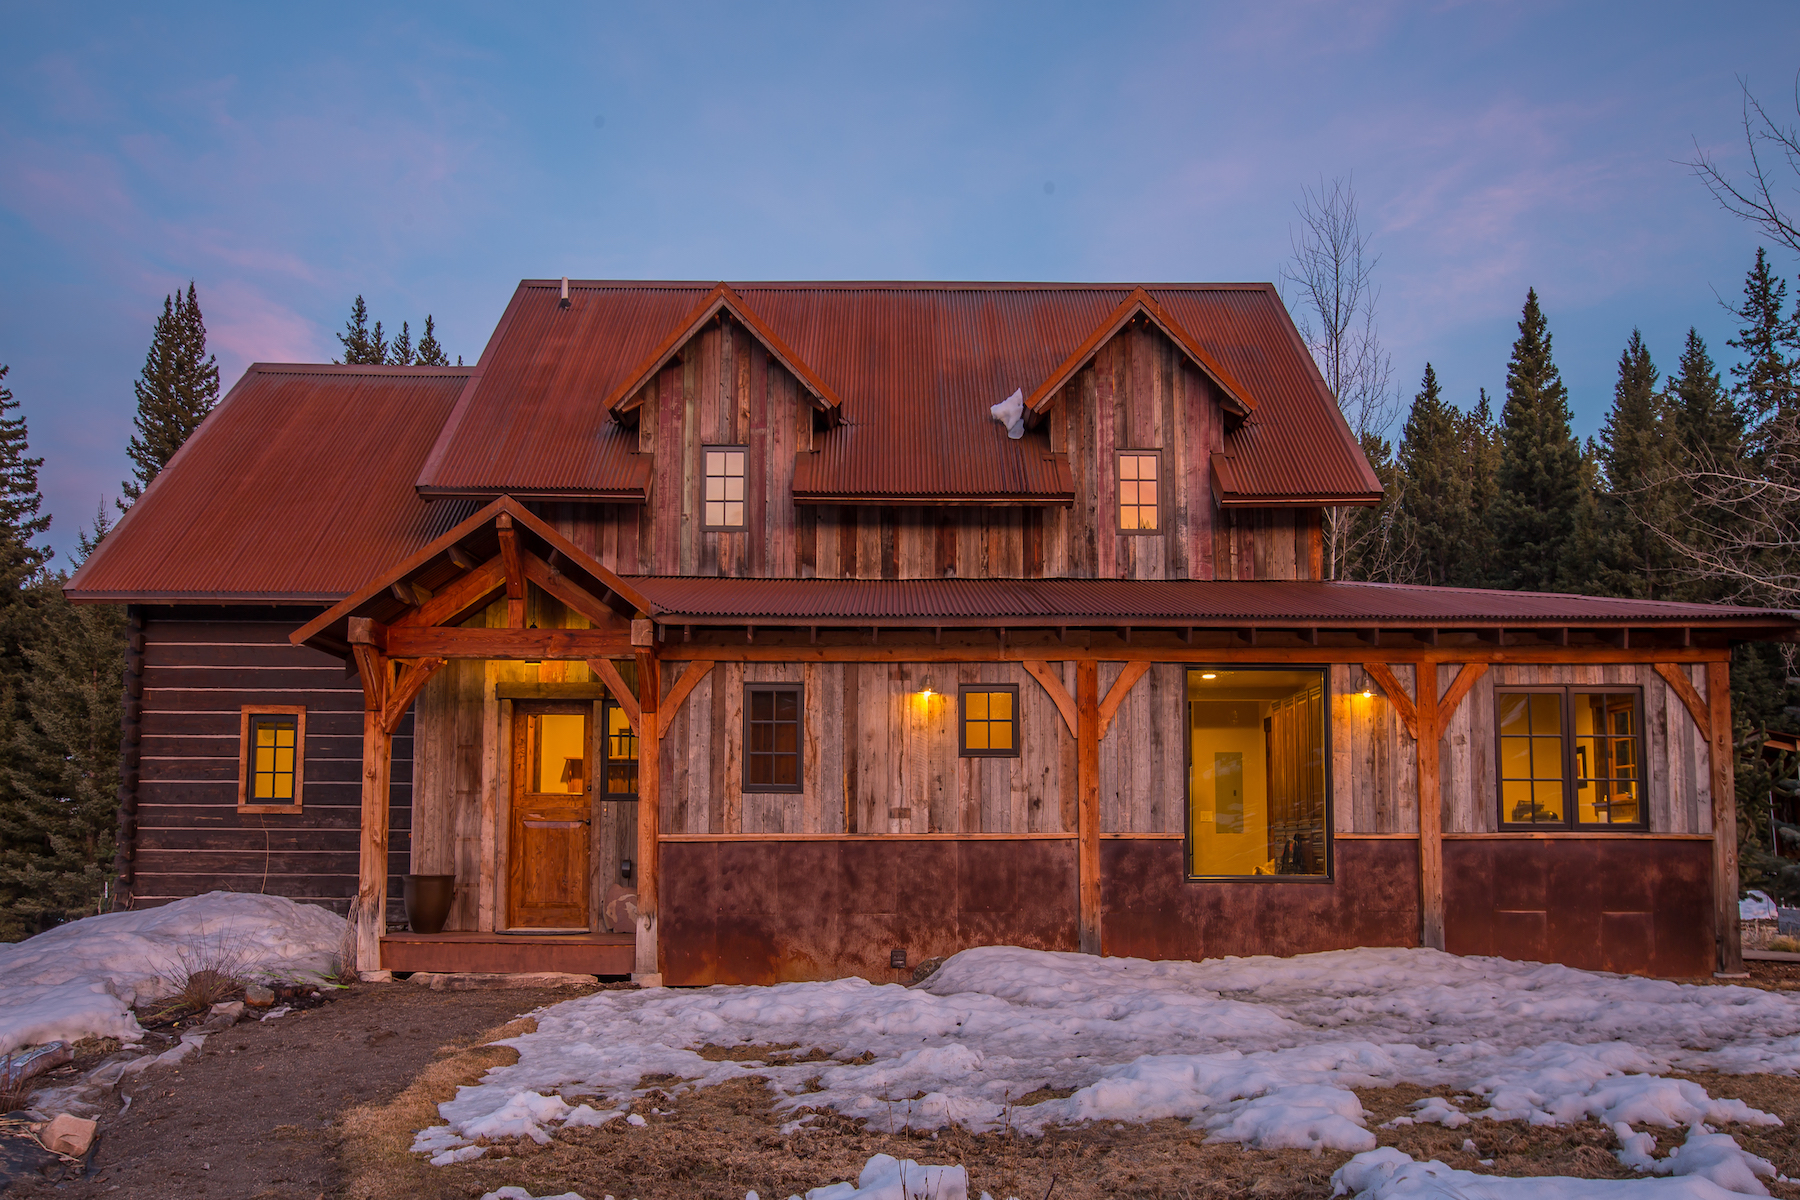 Single Family Home for Sale at 920 Beavercreek Road 920 Beaver Creek Road Big Sky, Montana, 59716 United States